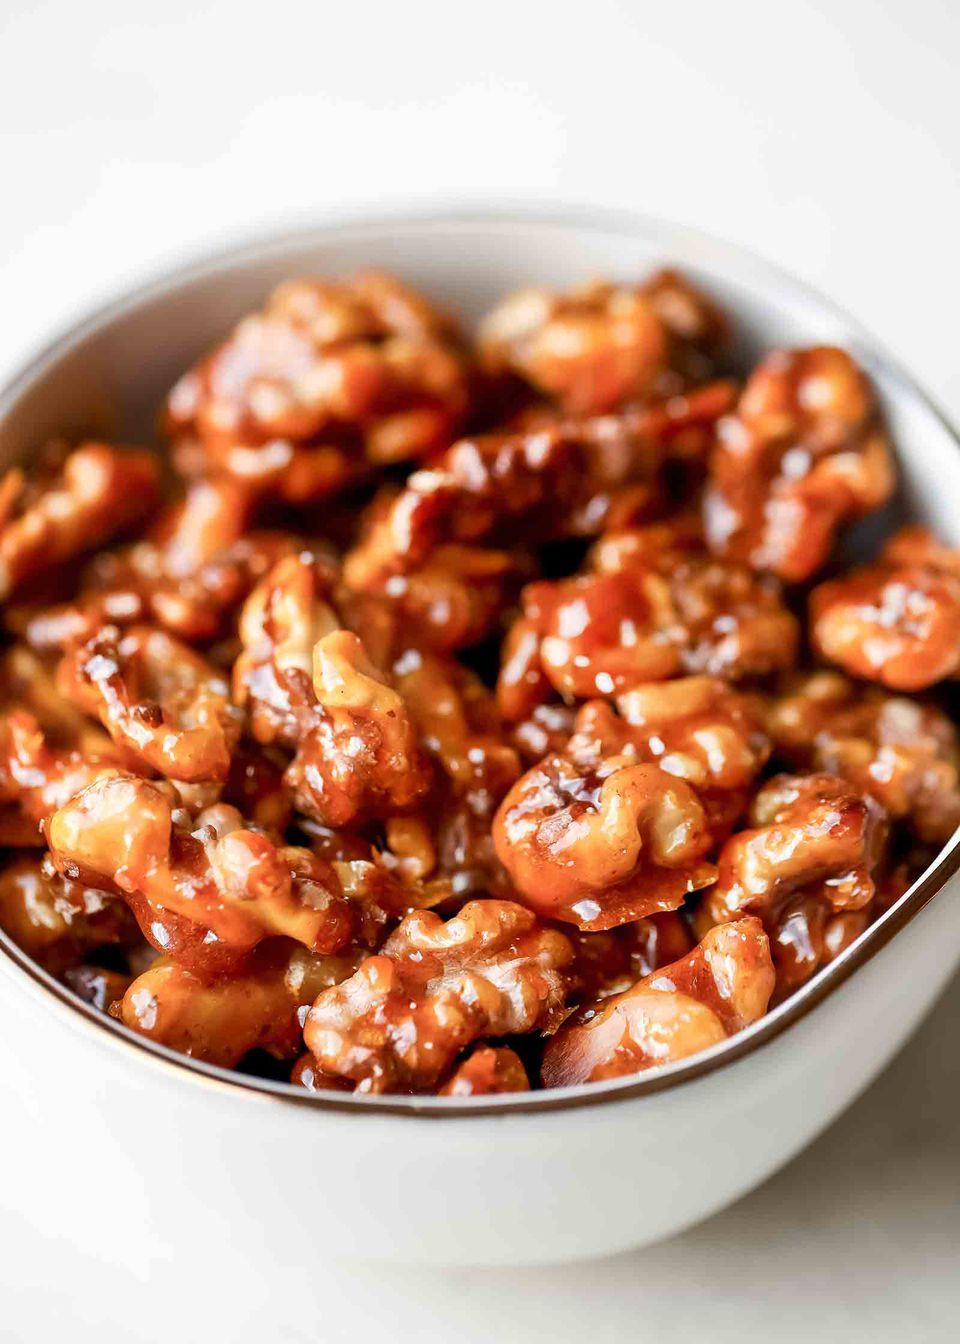 How to make caramelized walnuts